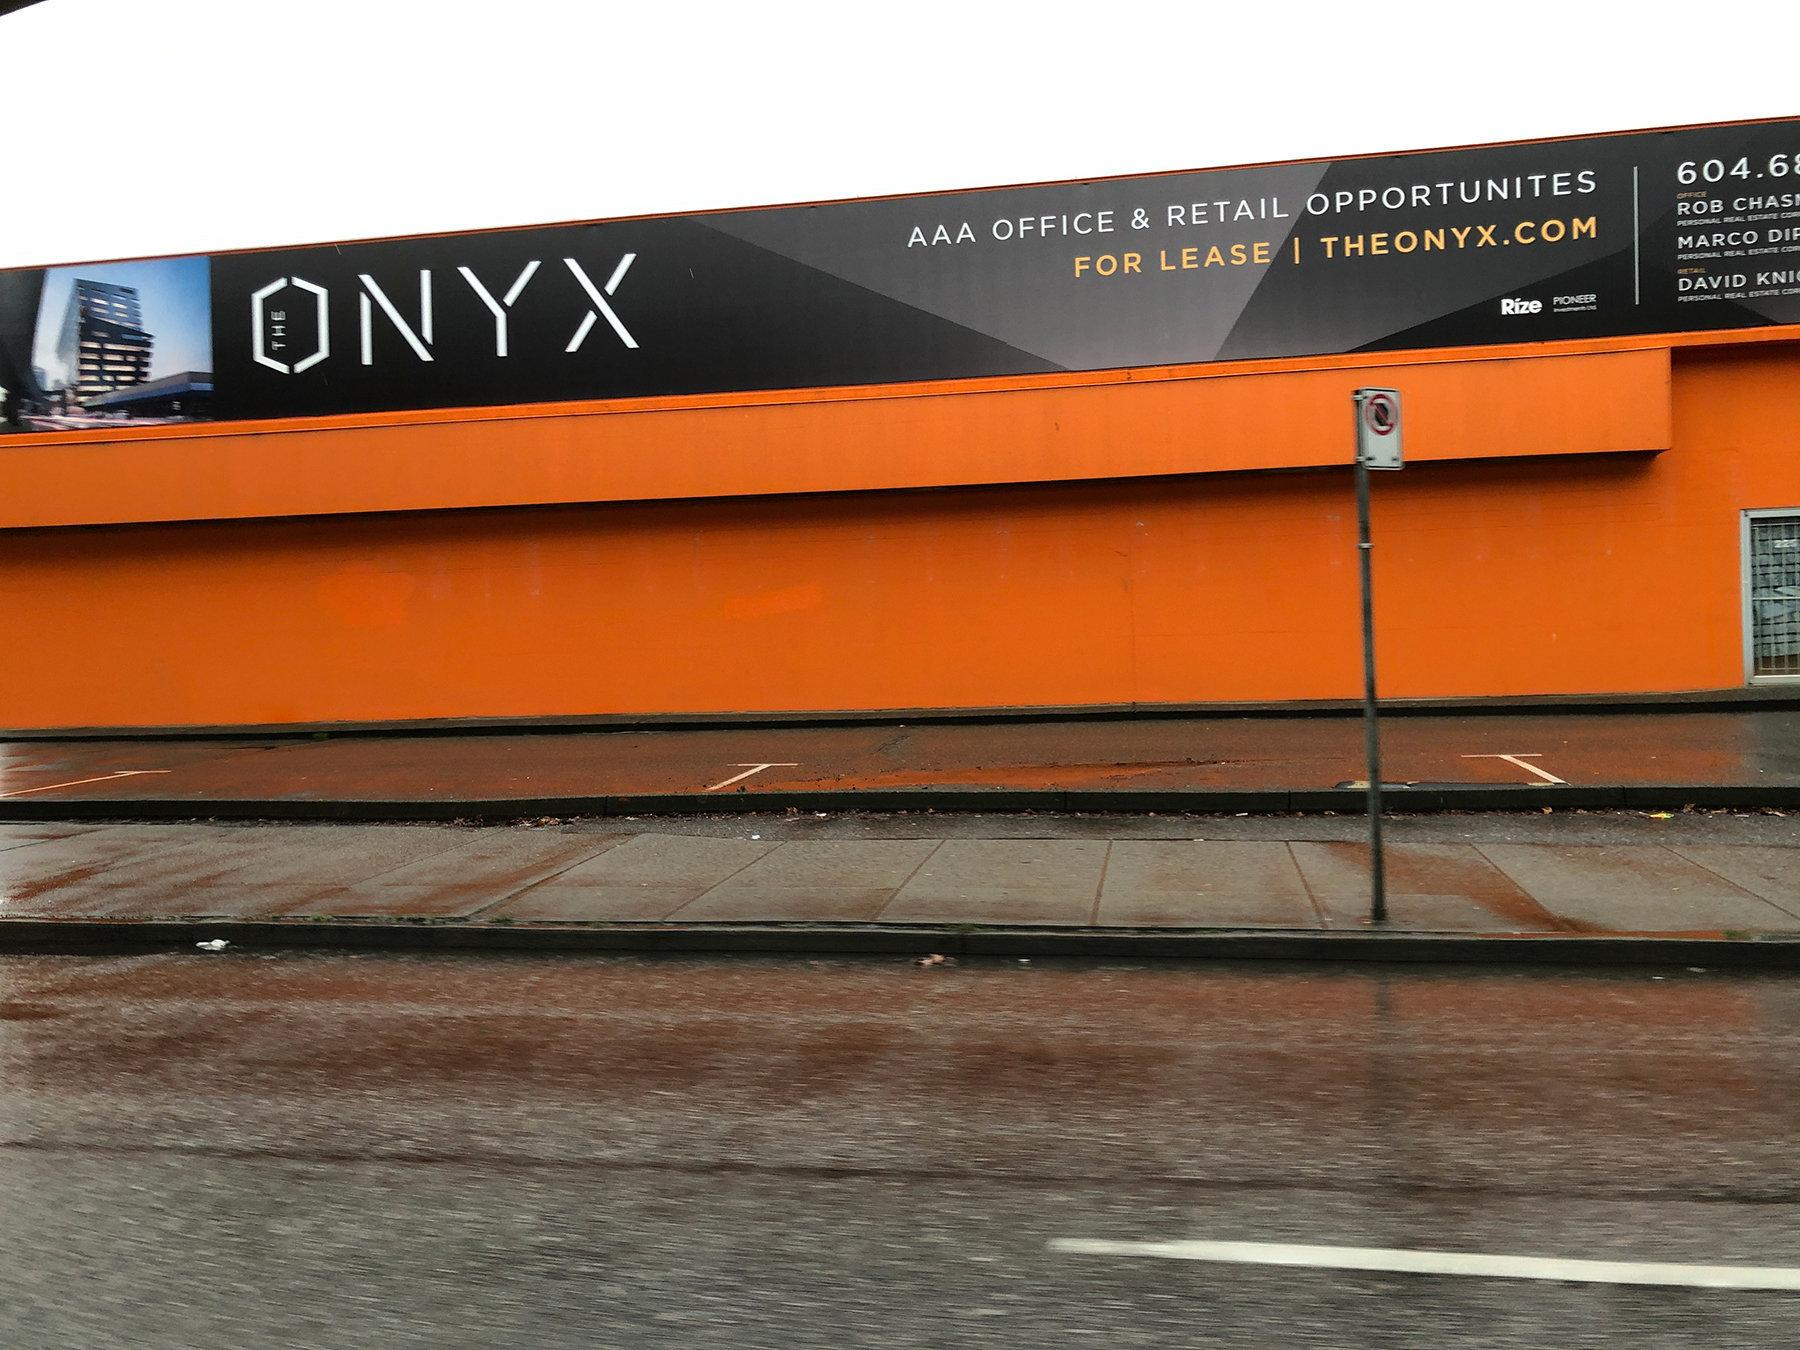 The Onyx 1296 Station Street Location Street View!